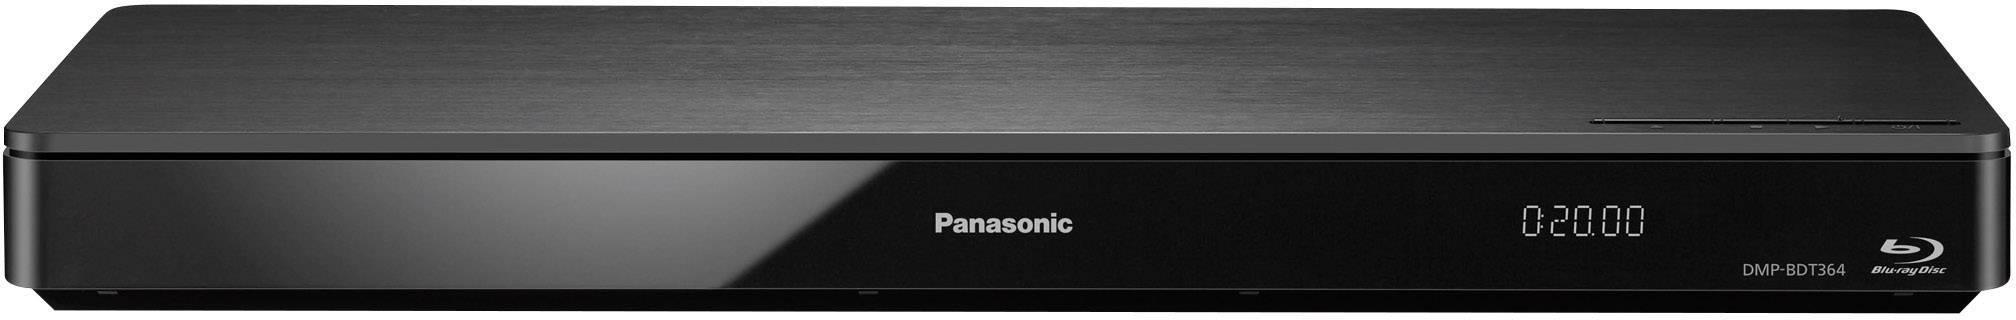 Panasonic DMP-BDT364EG Blu-ray Player Driver (2019)